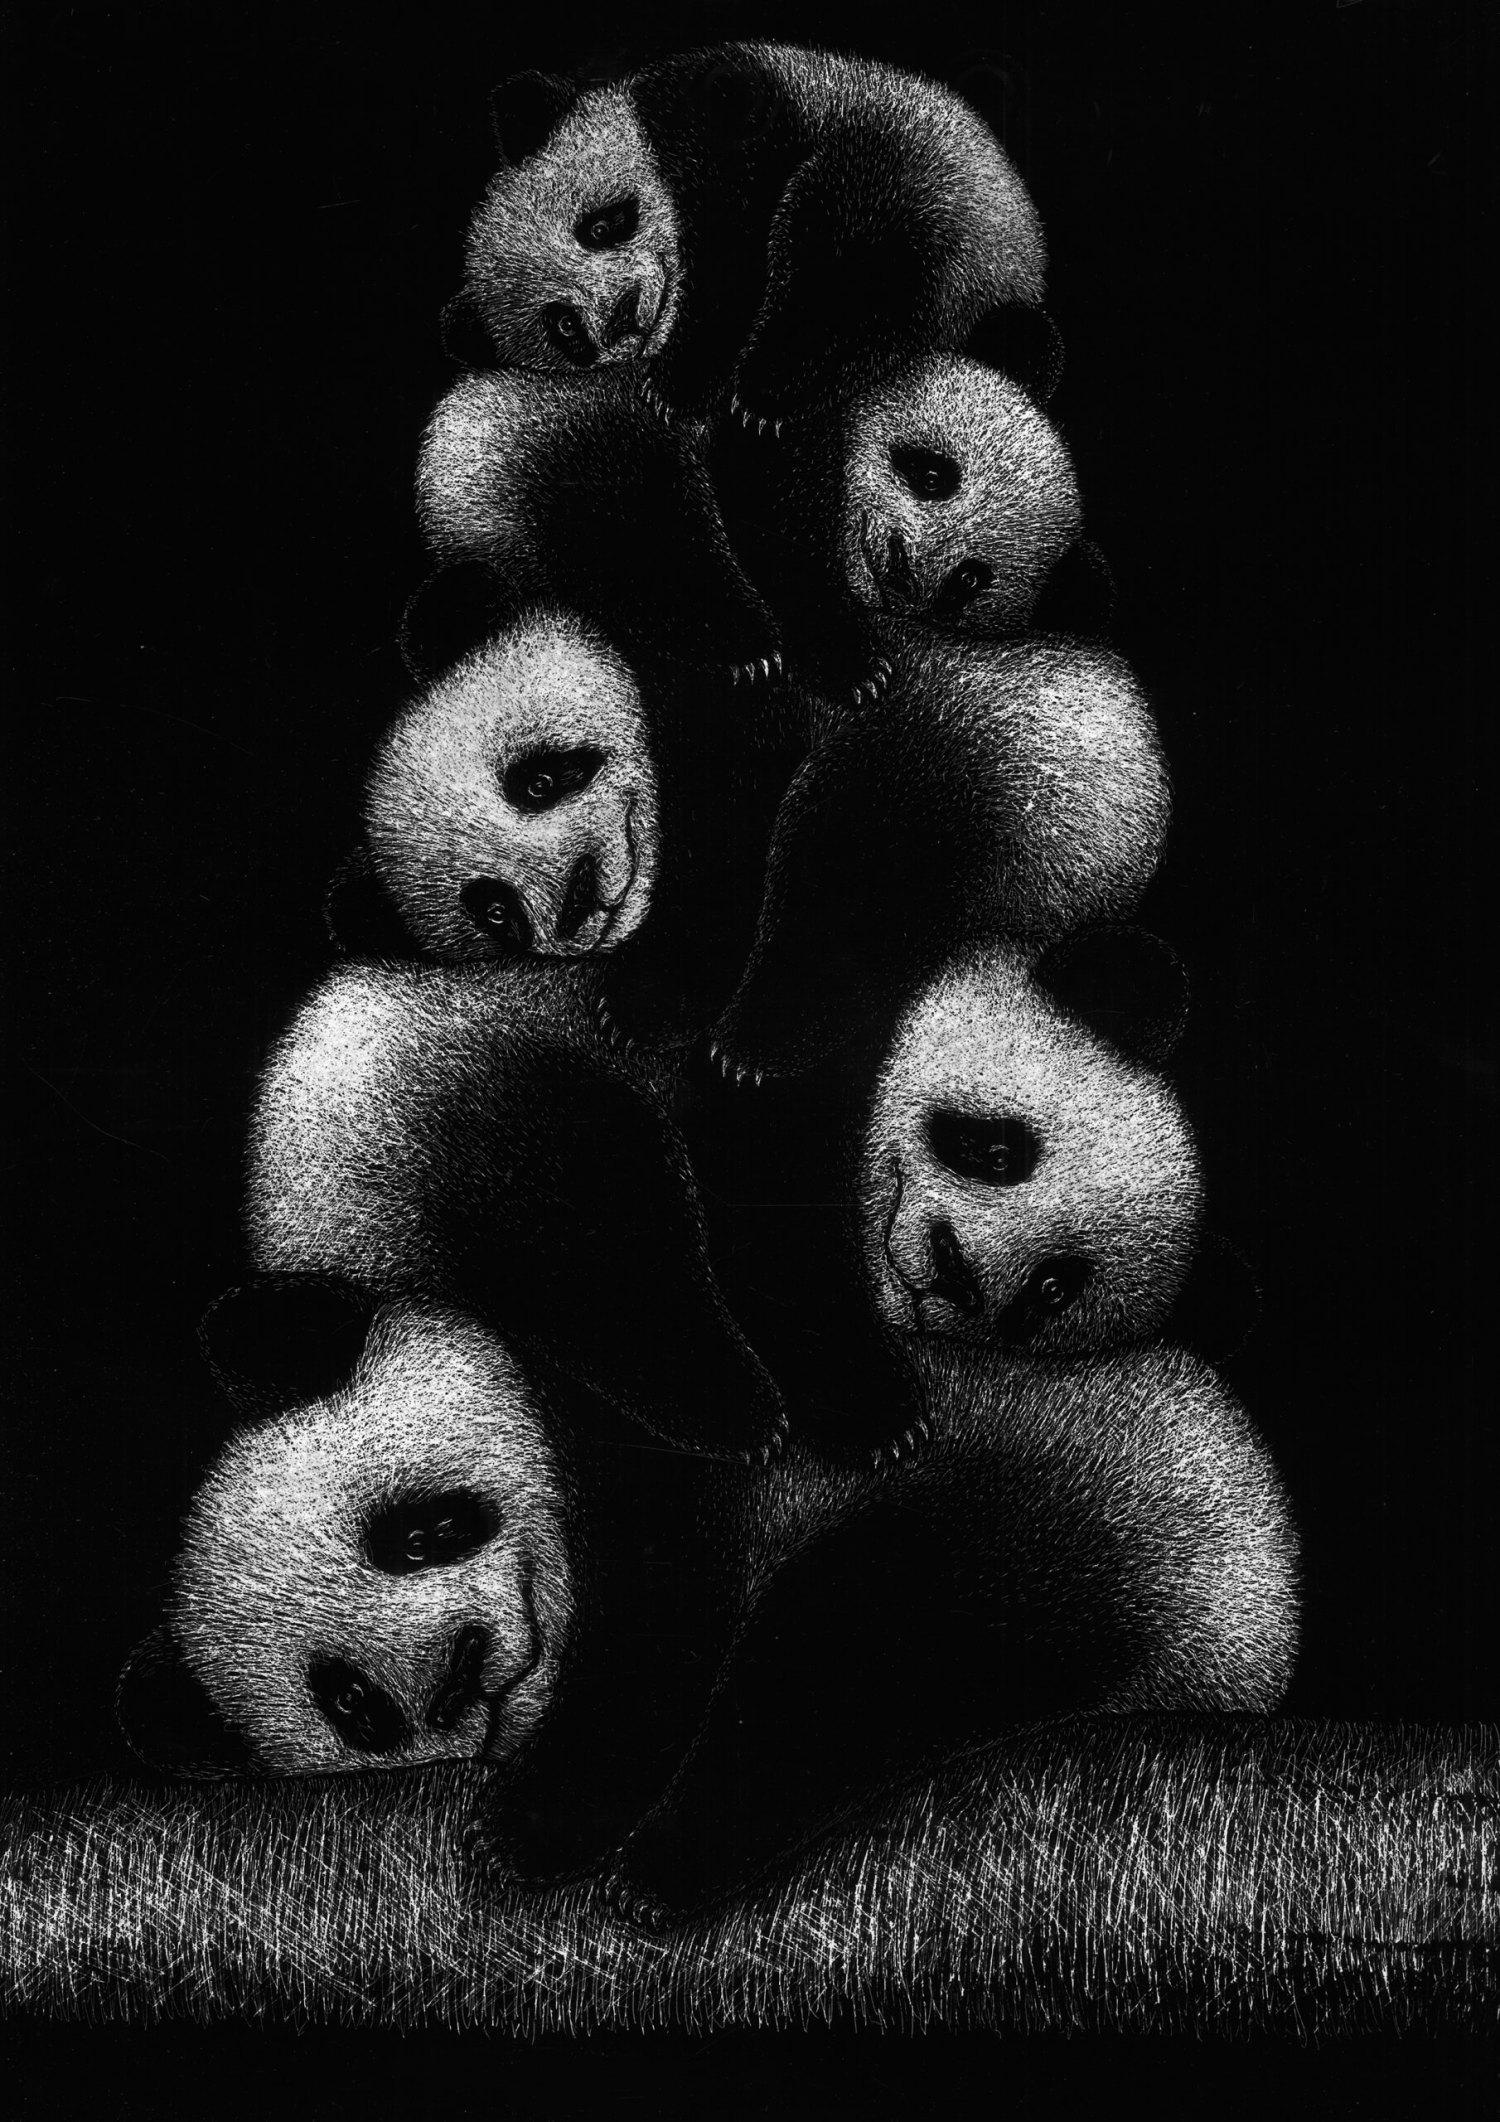 Panda - Lia Mariani